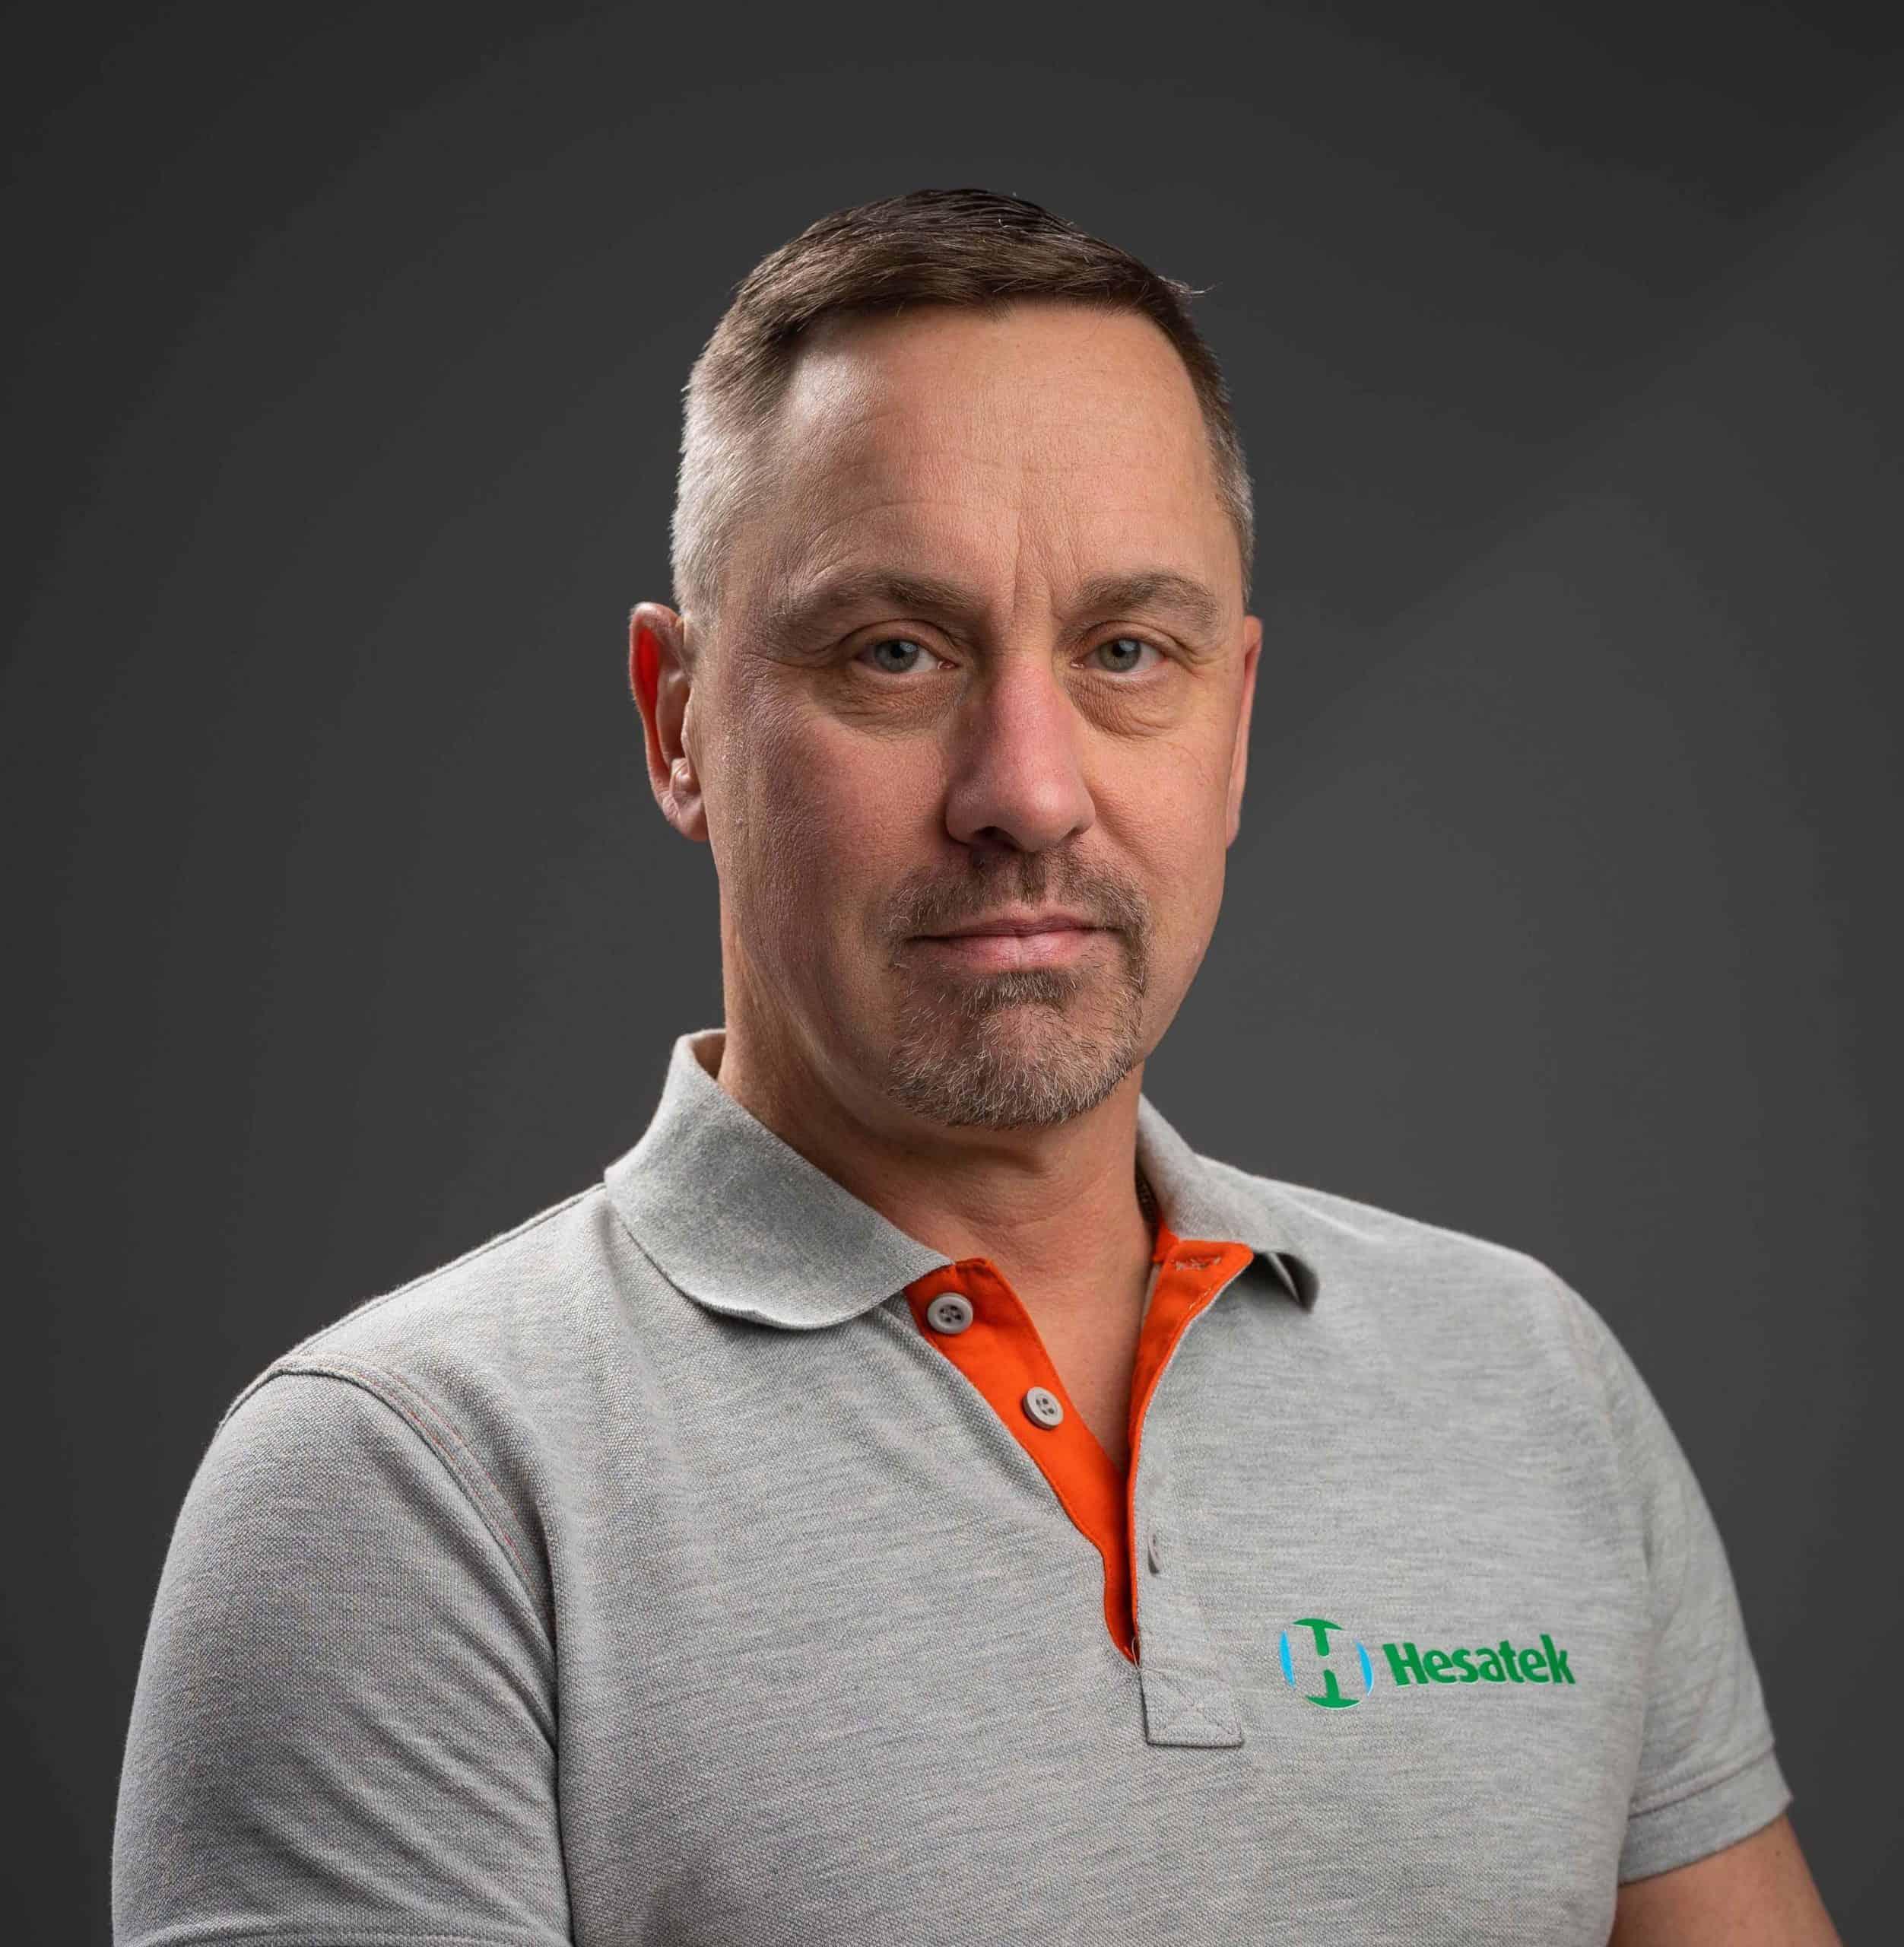 Hesatek Oy Marco Forsström